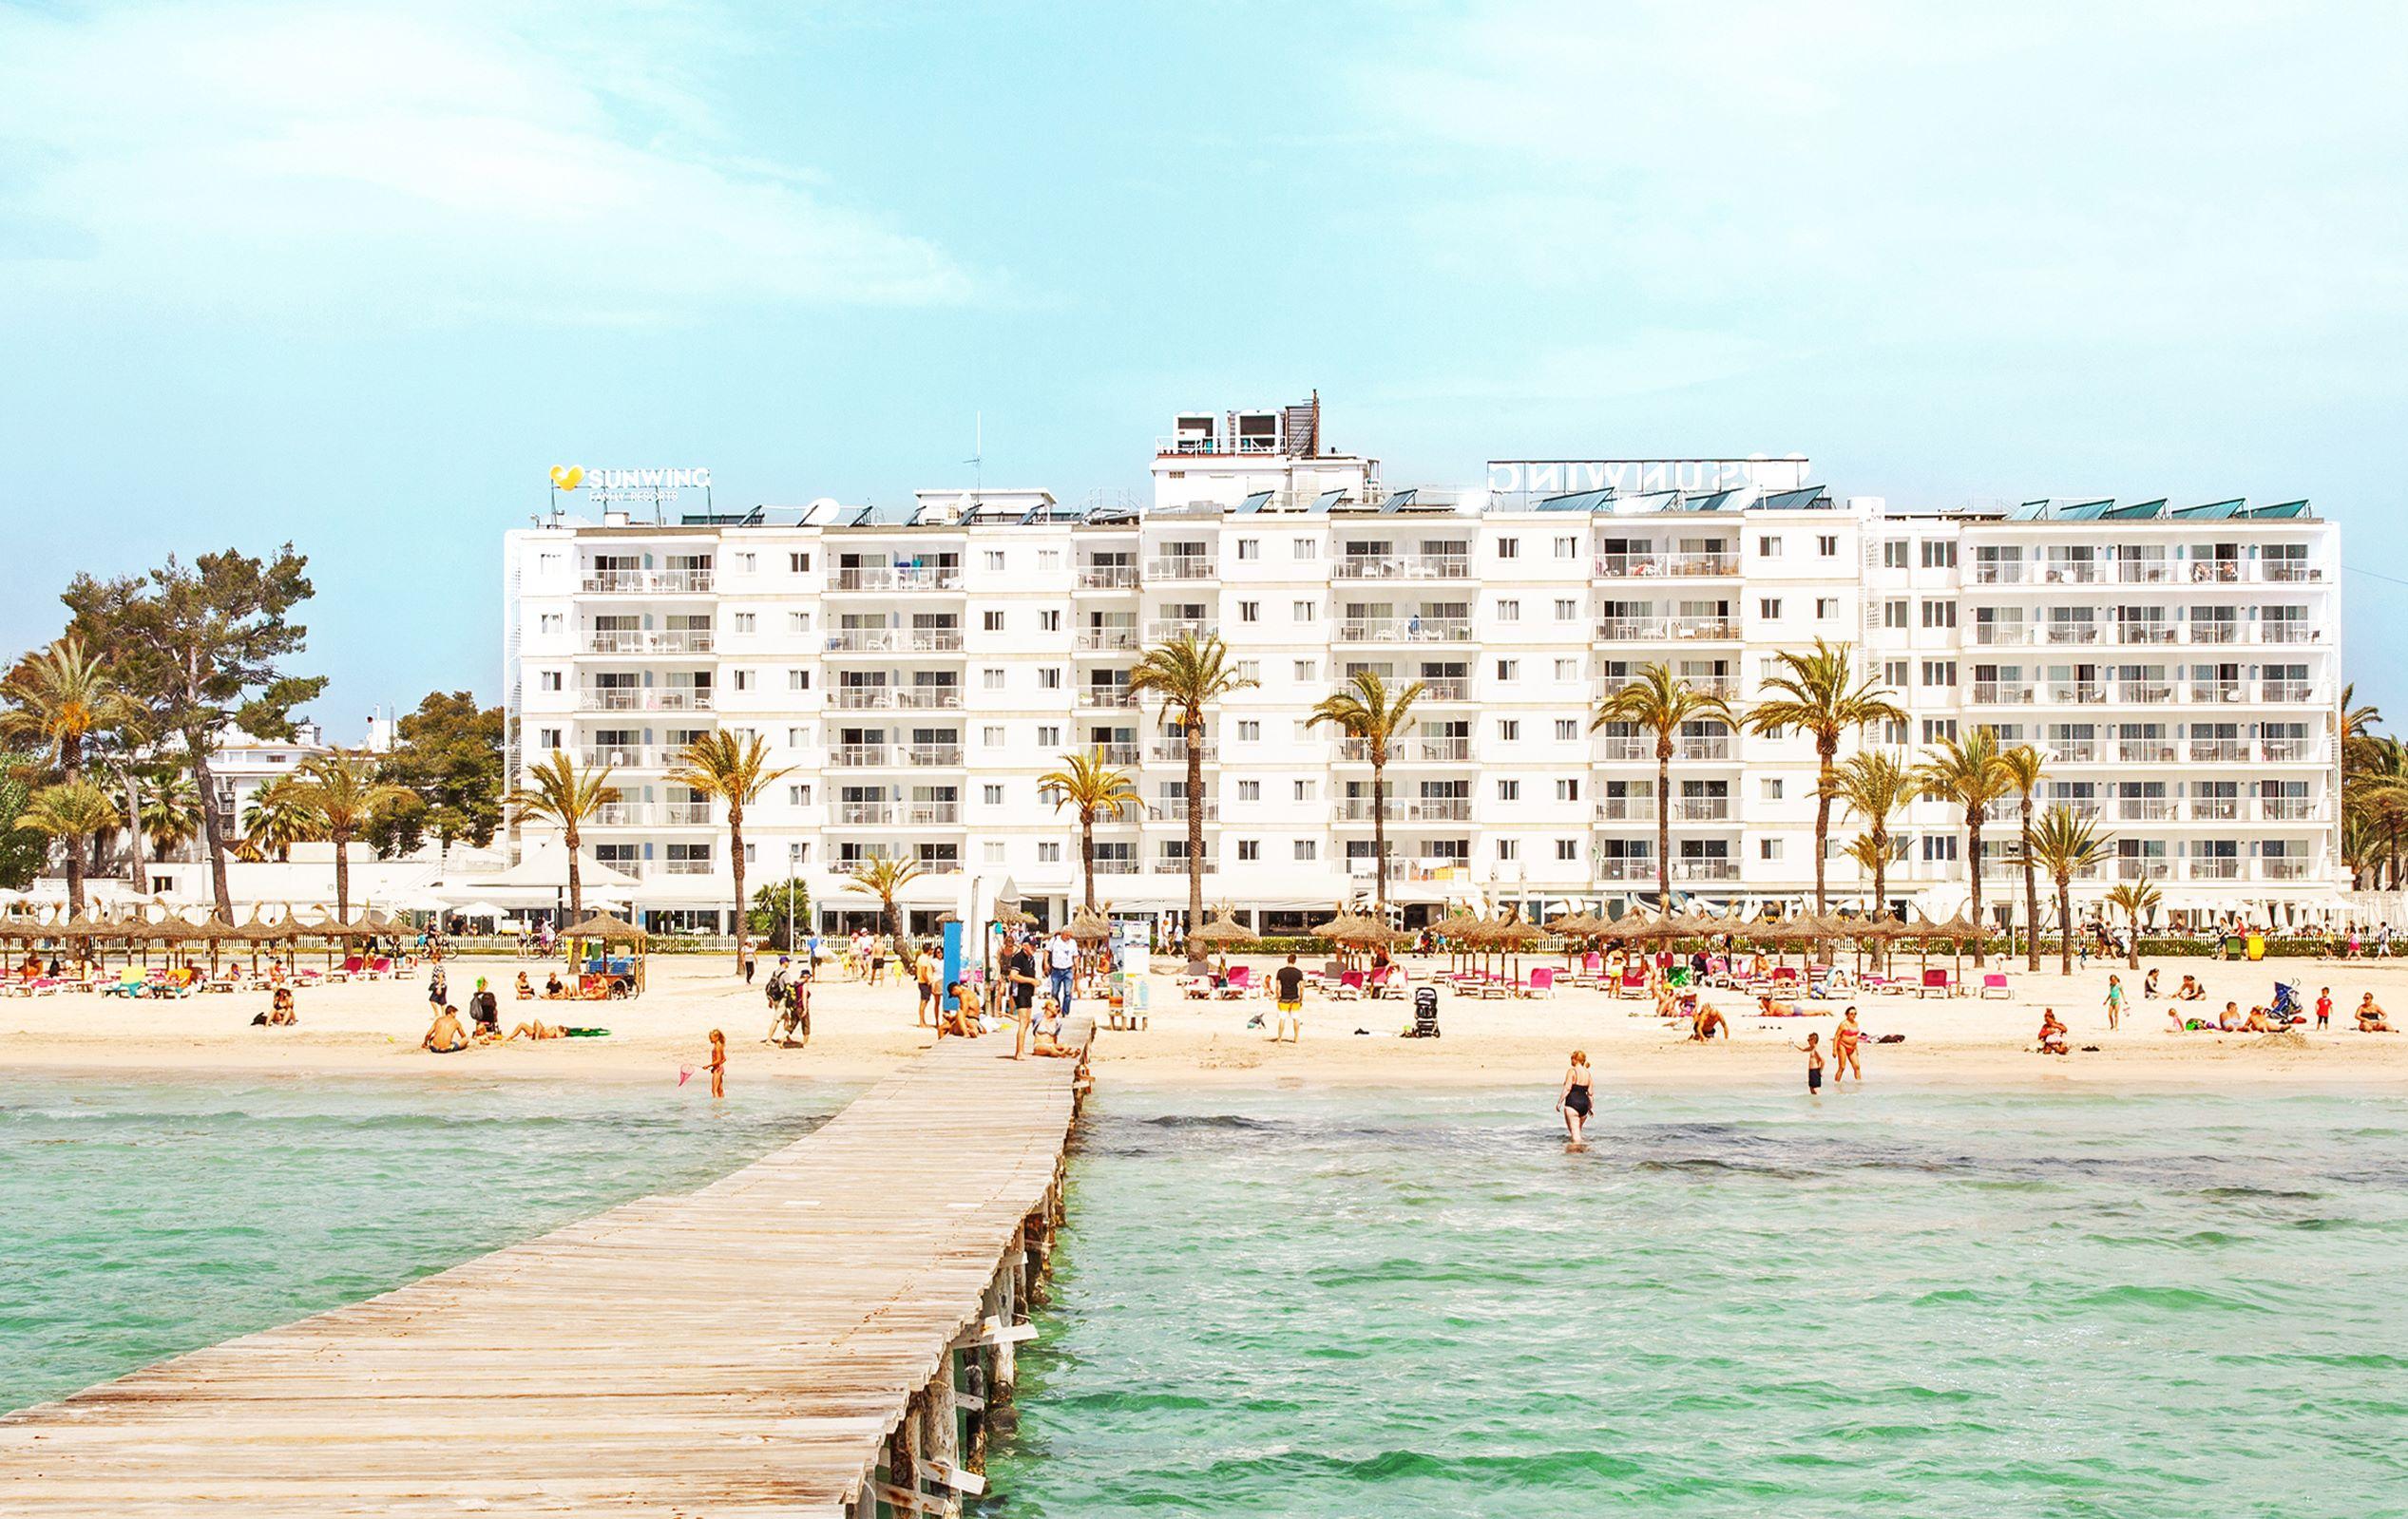 Sunwing Alucia Beach på Mallorca. Foto: Spies